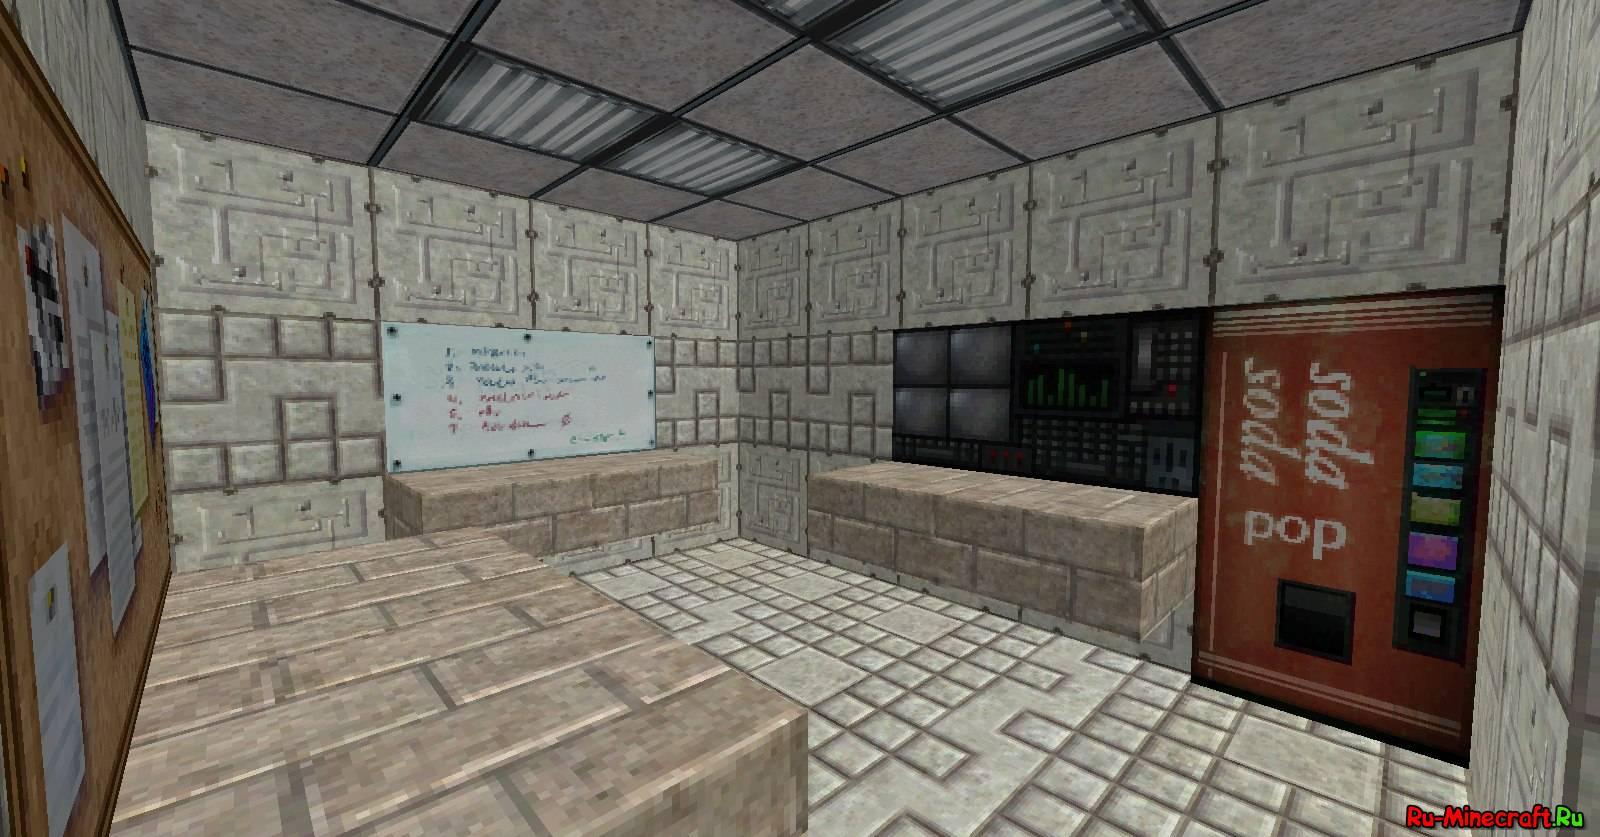 Minecraft текстуры half life, бесплатные фото ...: pictures11.ru/minecraft-tekstury-half-life.html